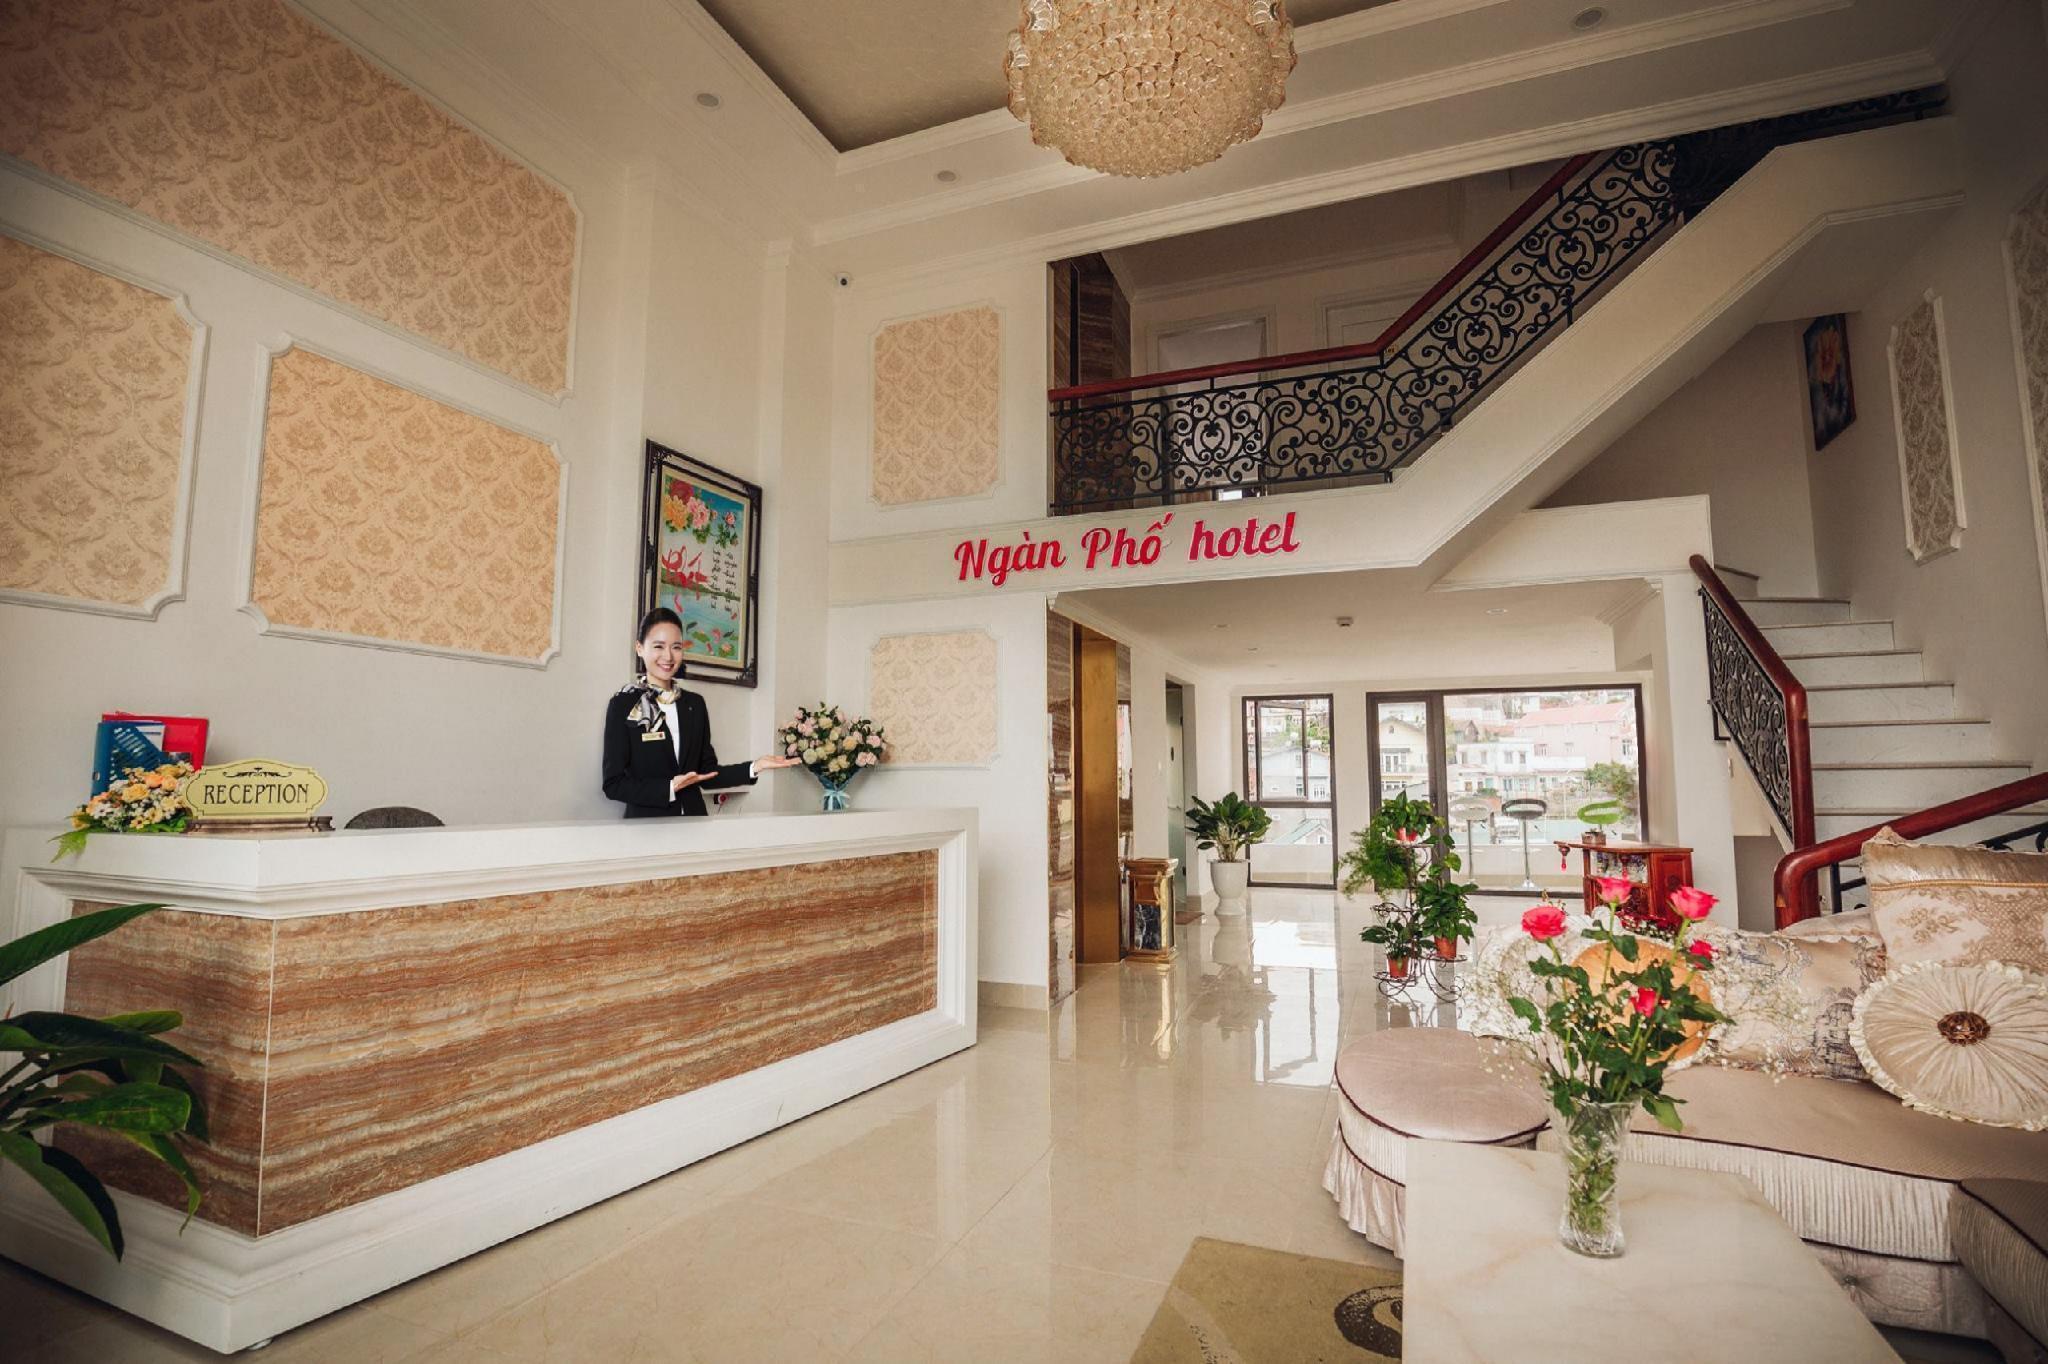 NGAN PHO HOTEL